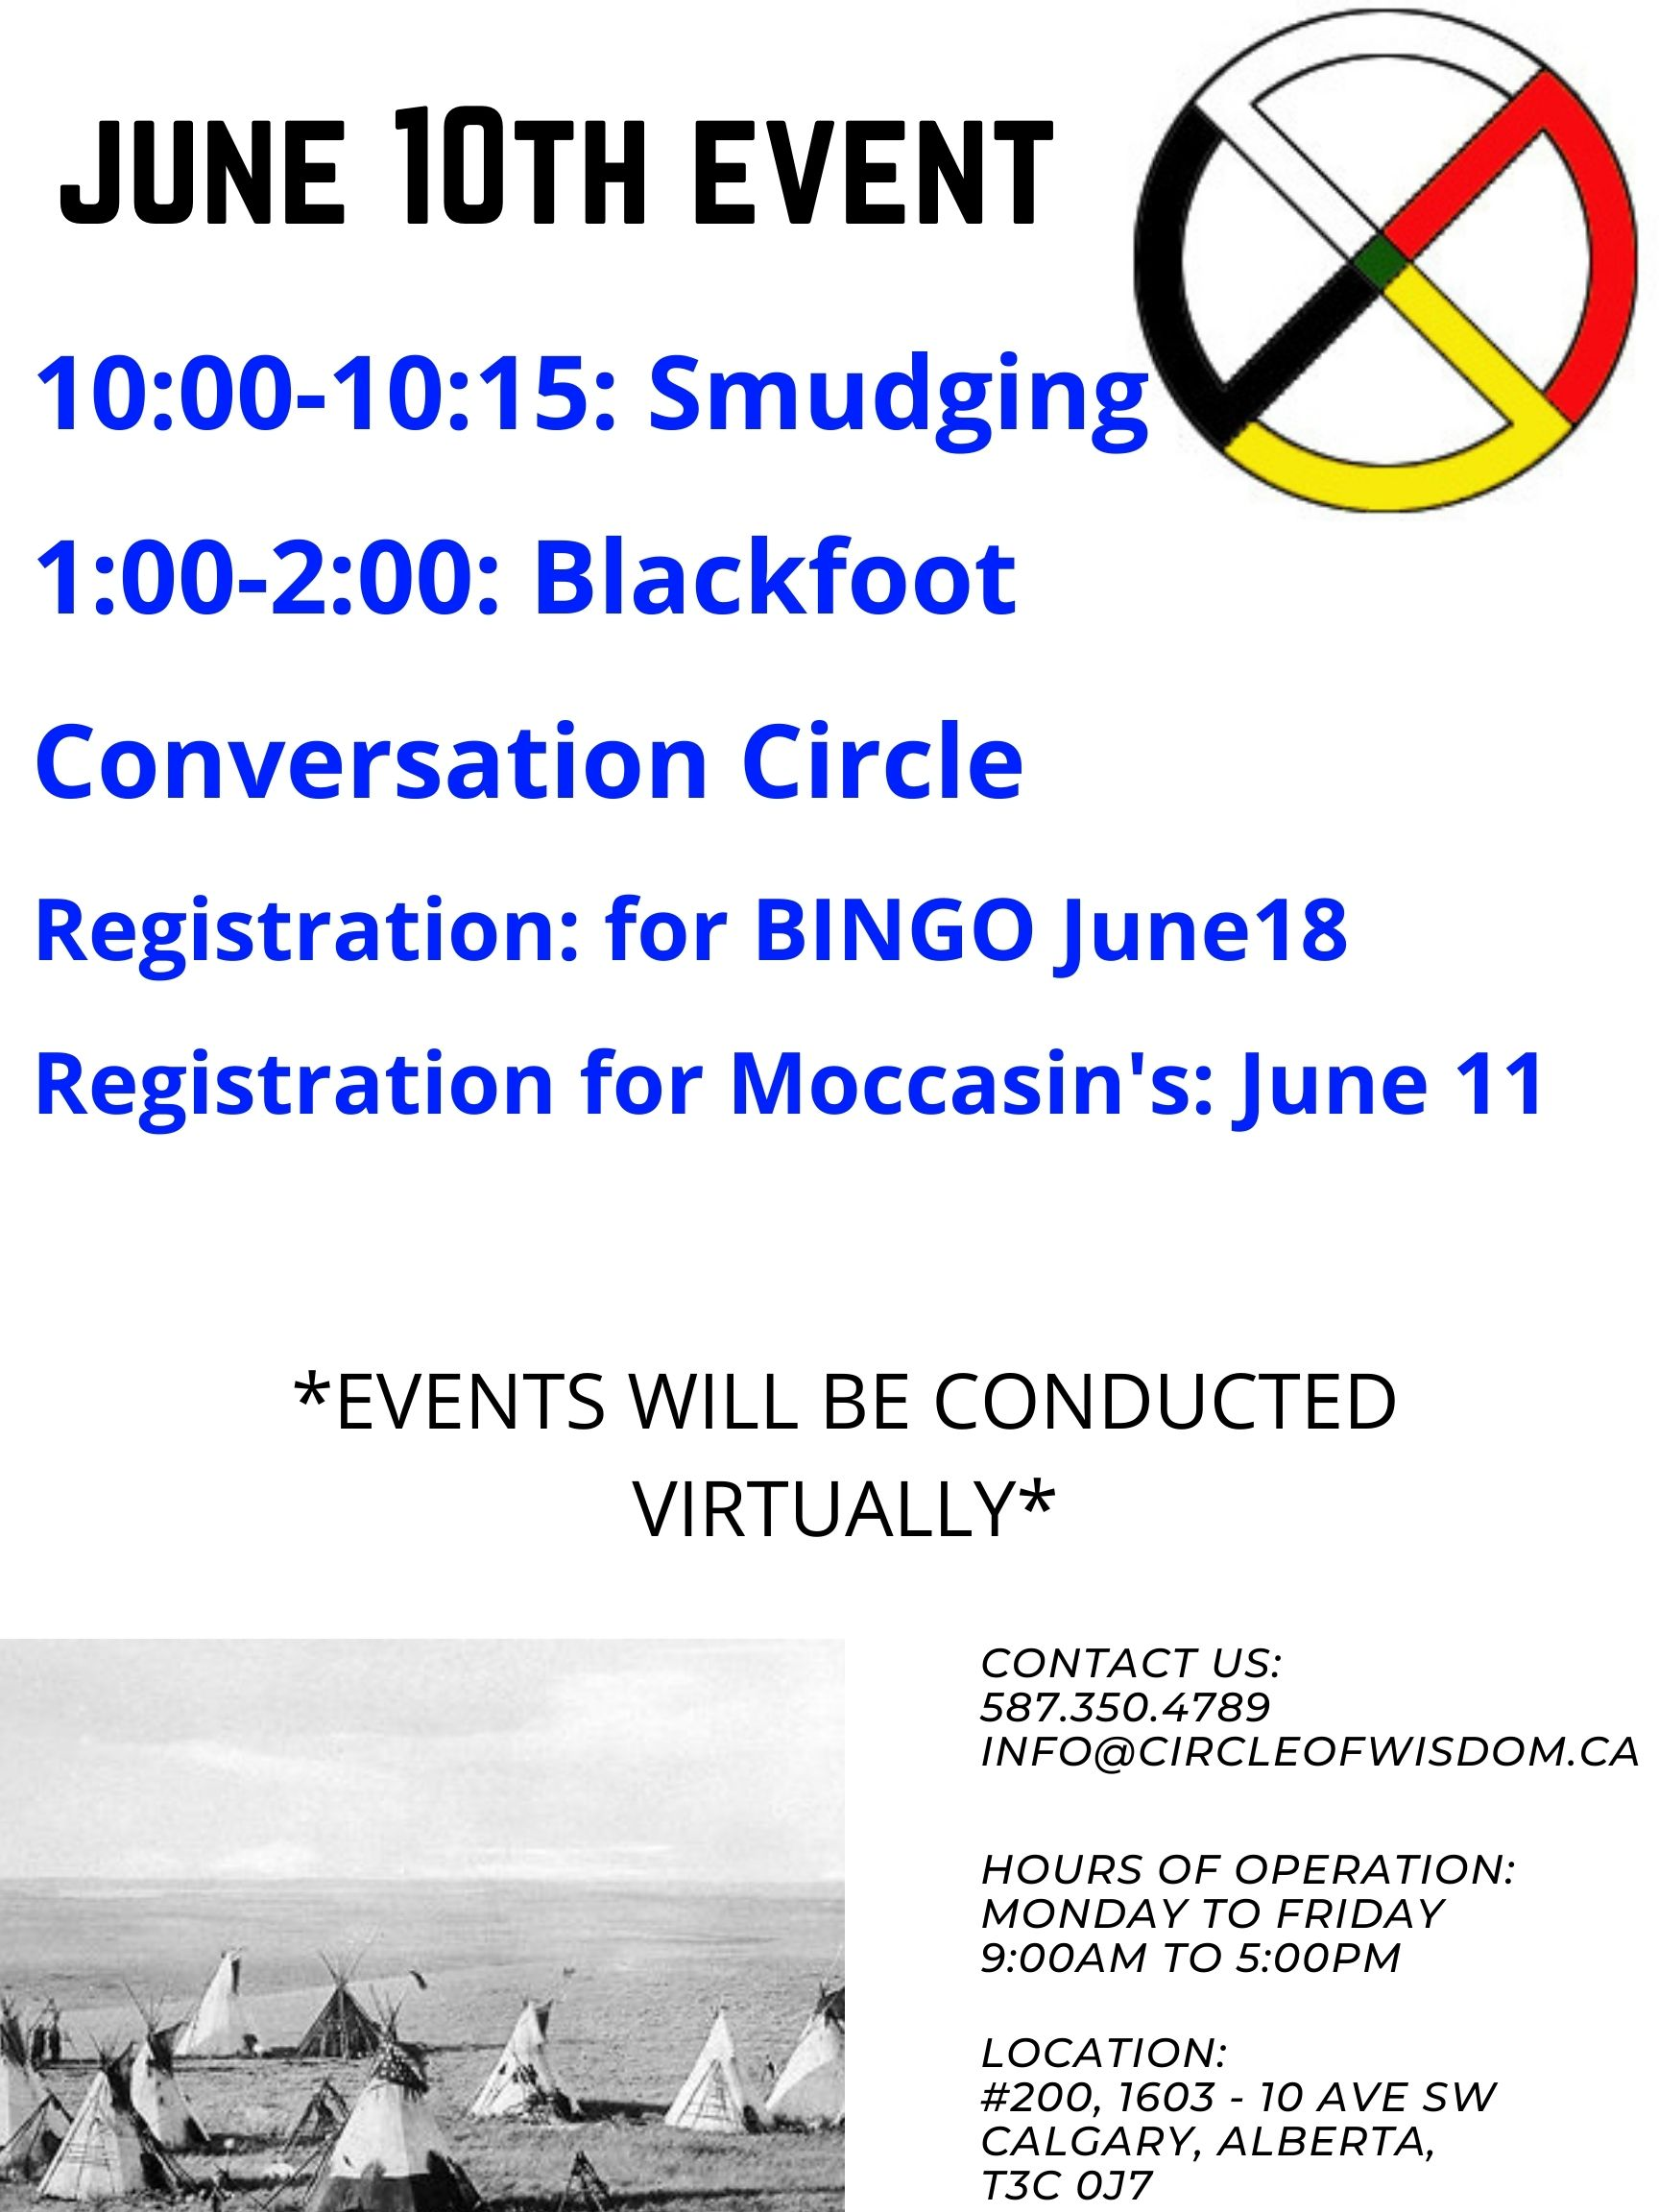 Blackfoot Conversation Circle